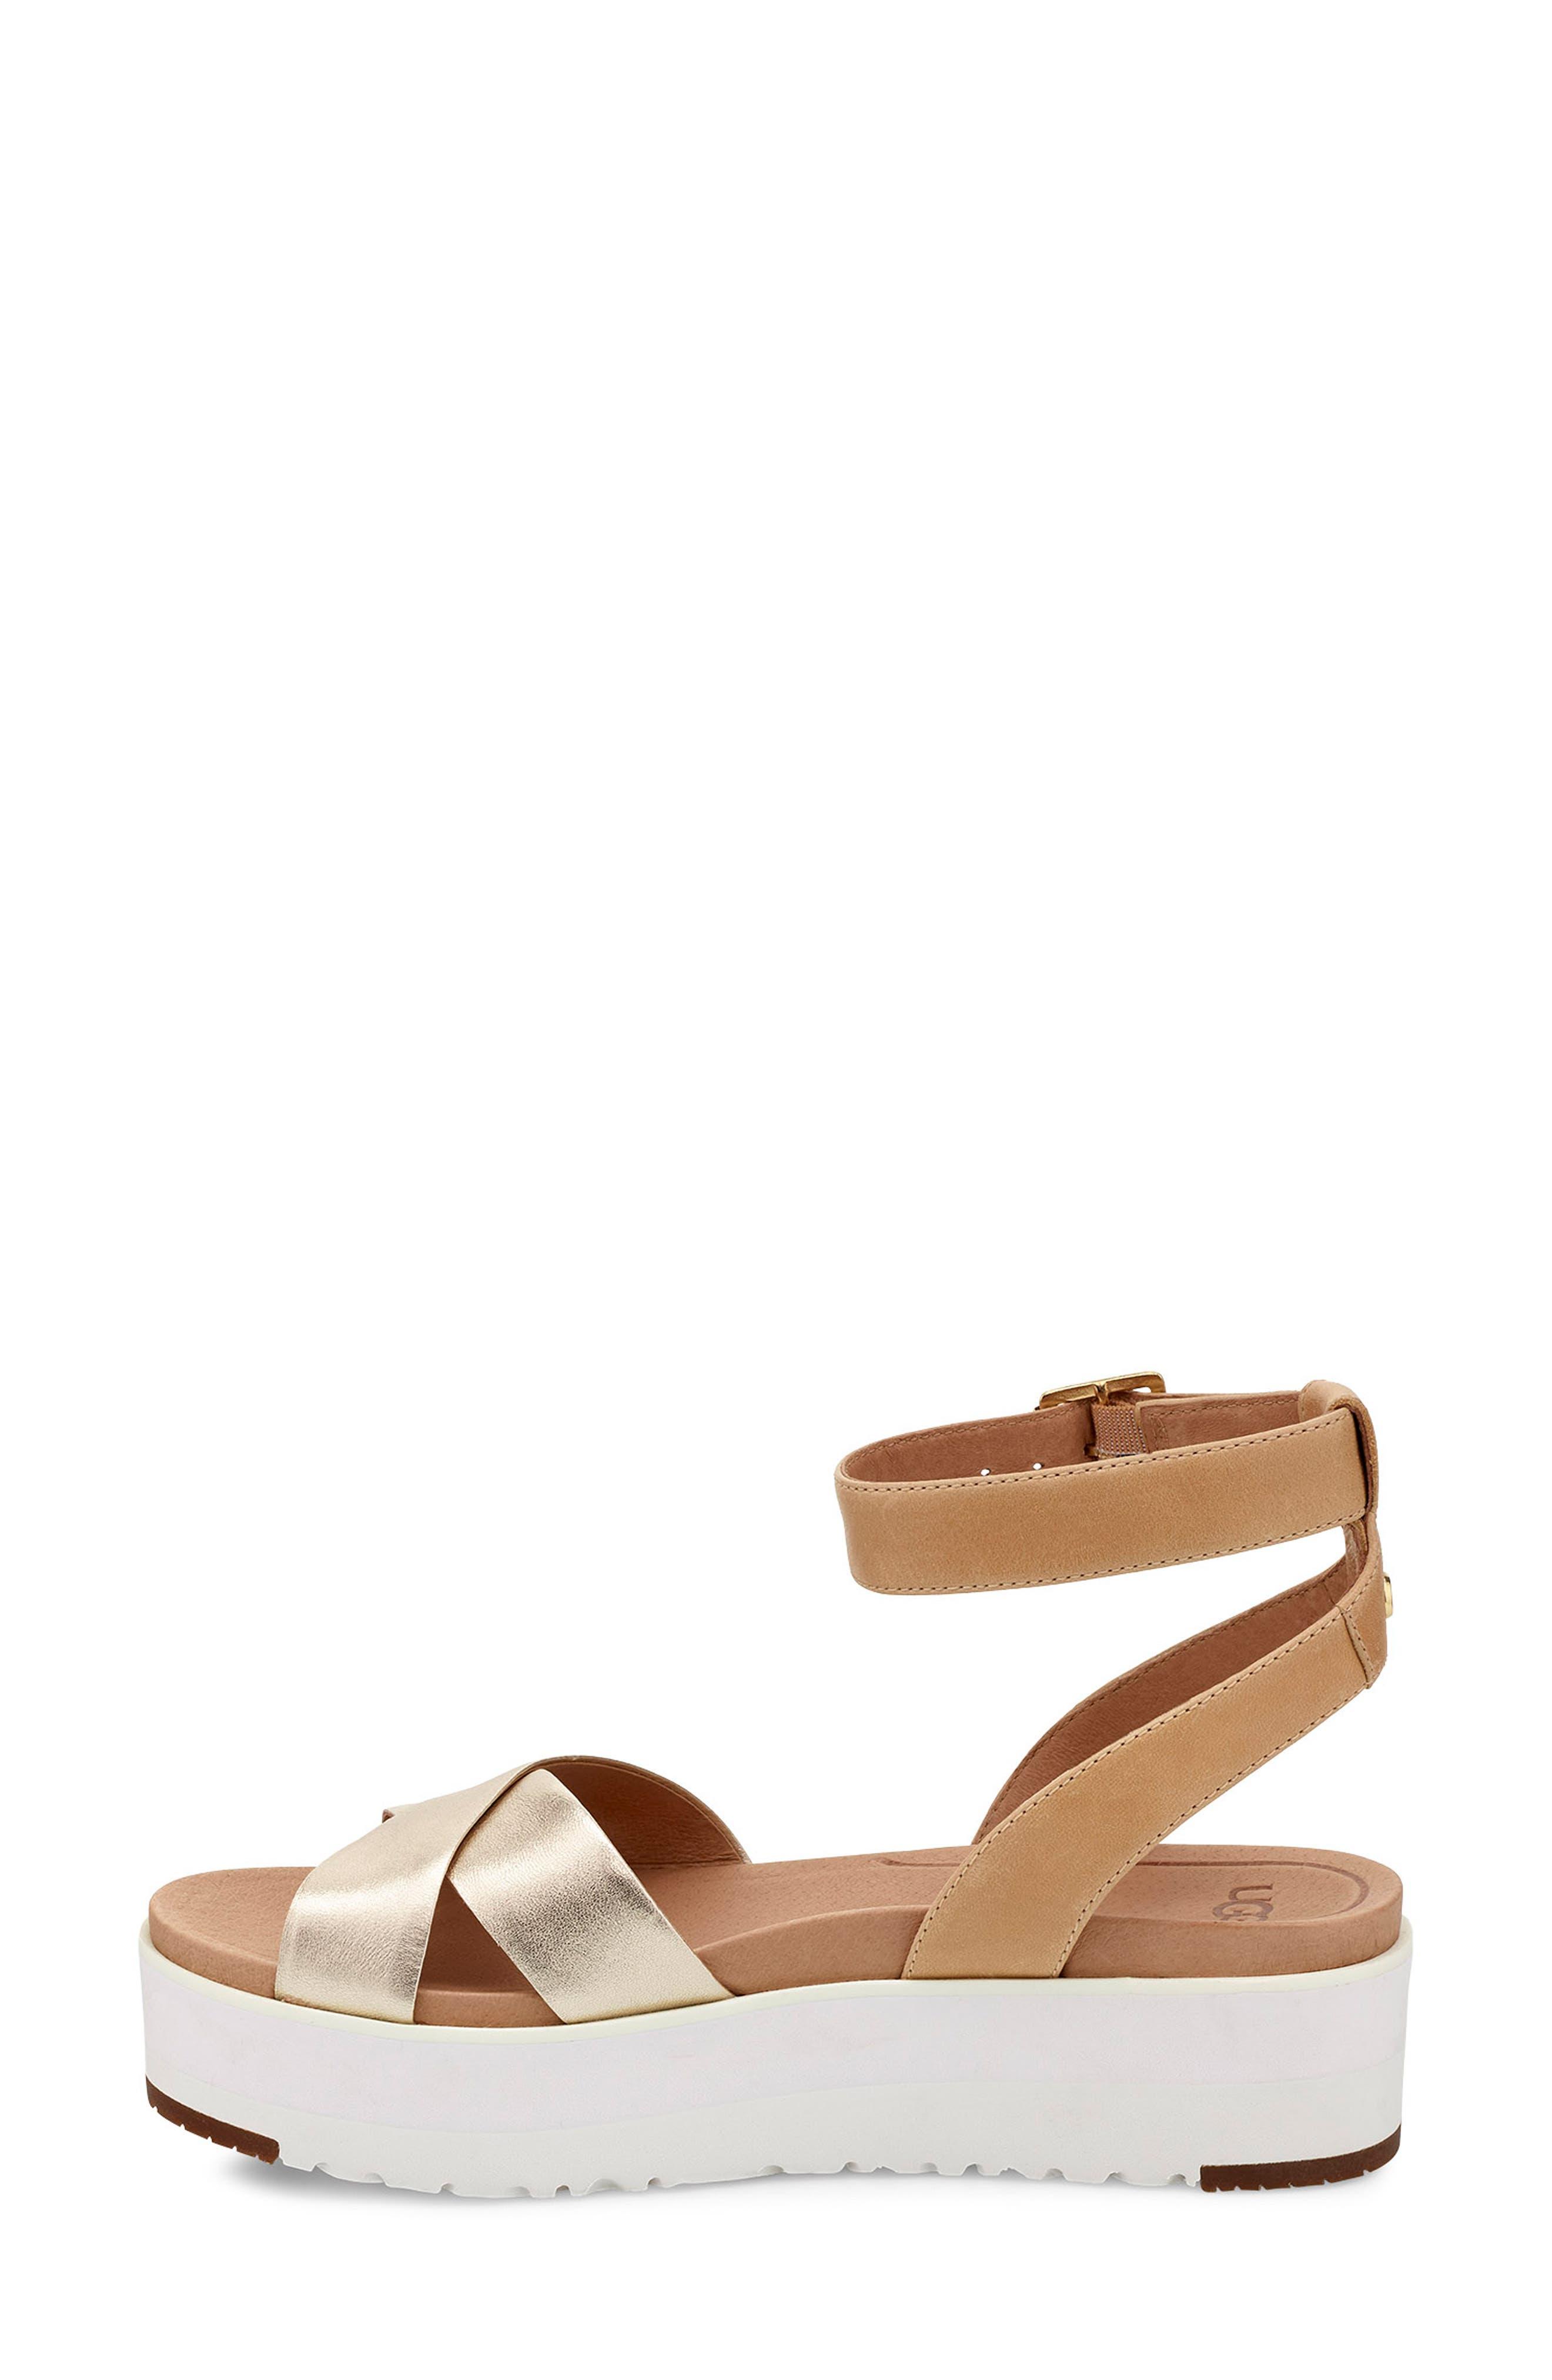 Tipton Metallic Platform Sandal,                             Alternate thumbnail 6, color,                             GOLD